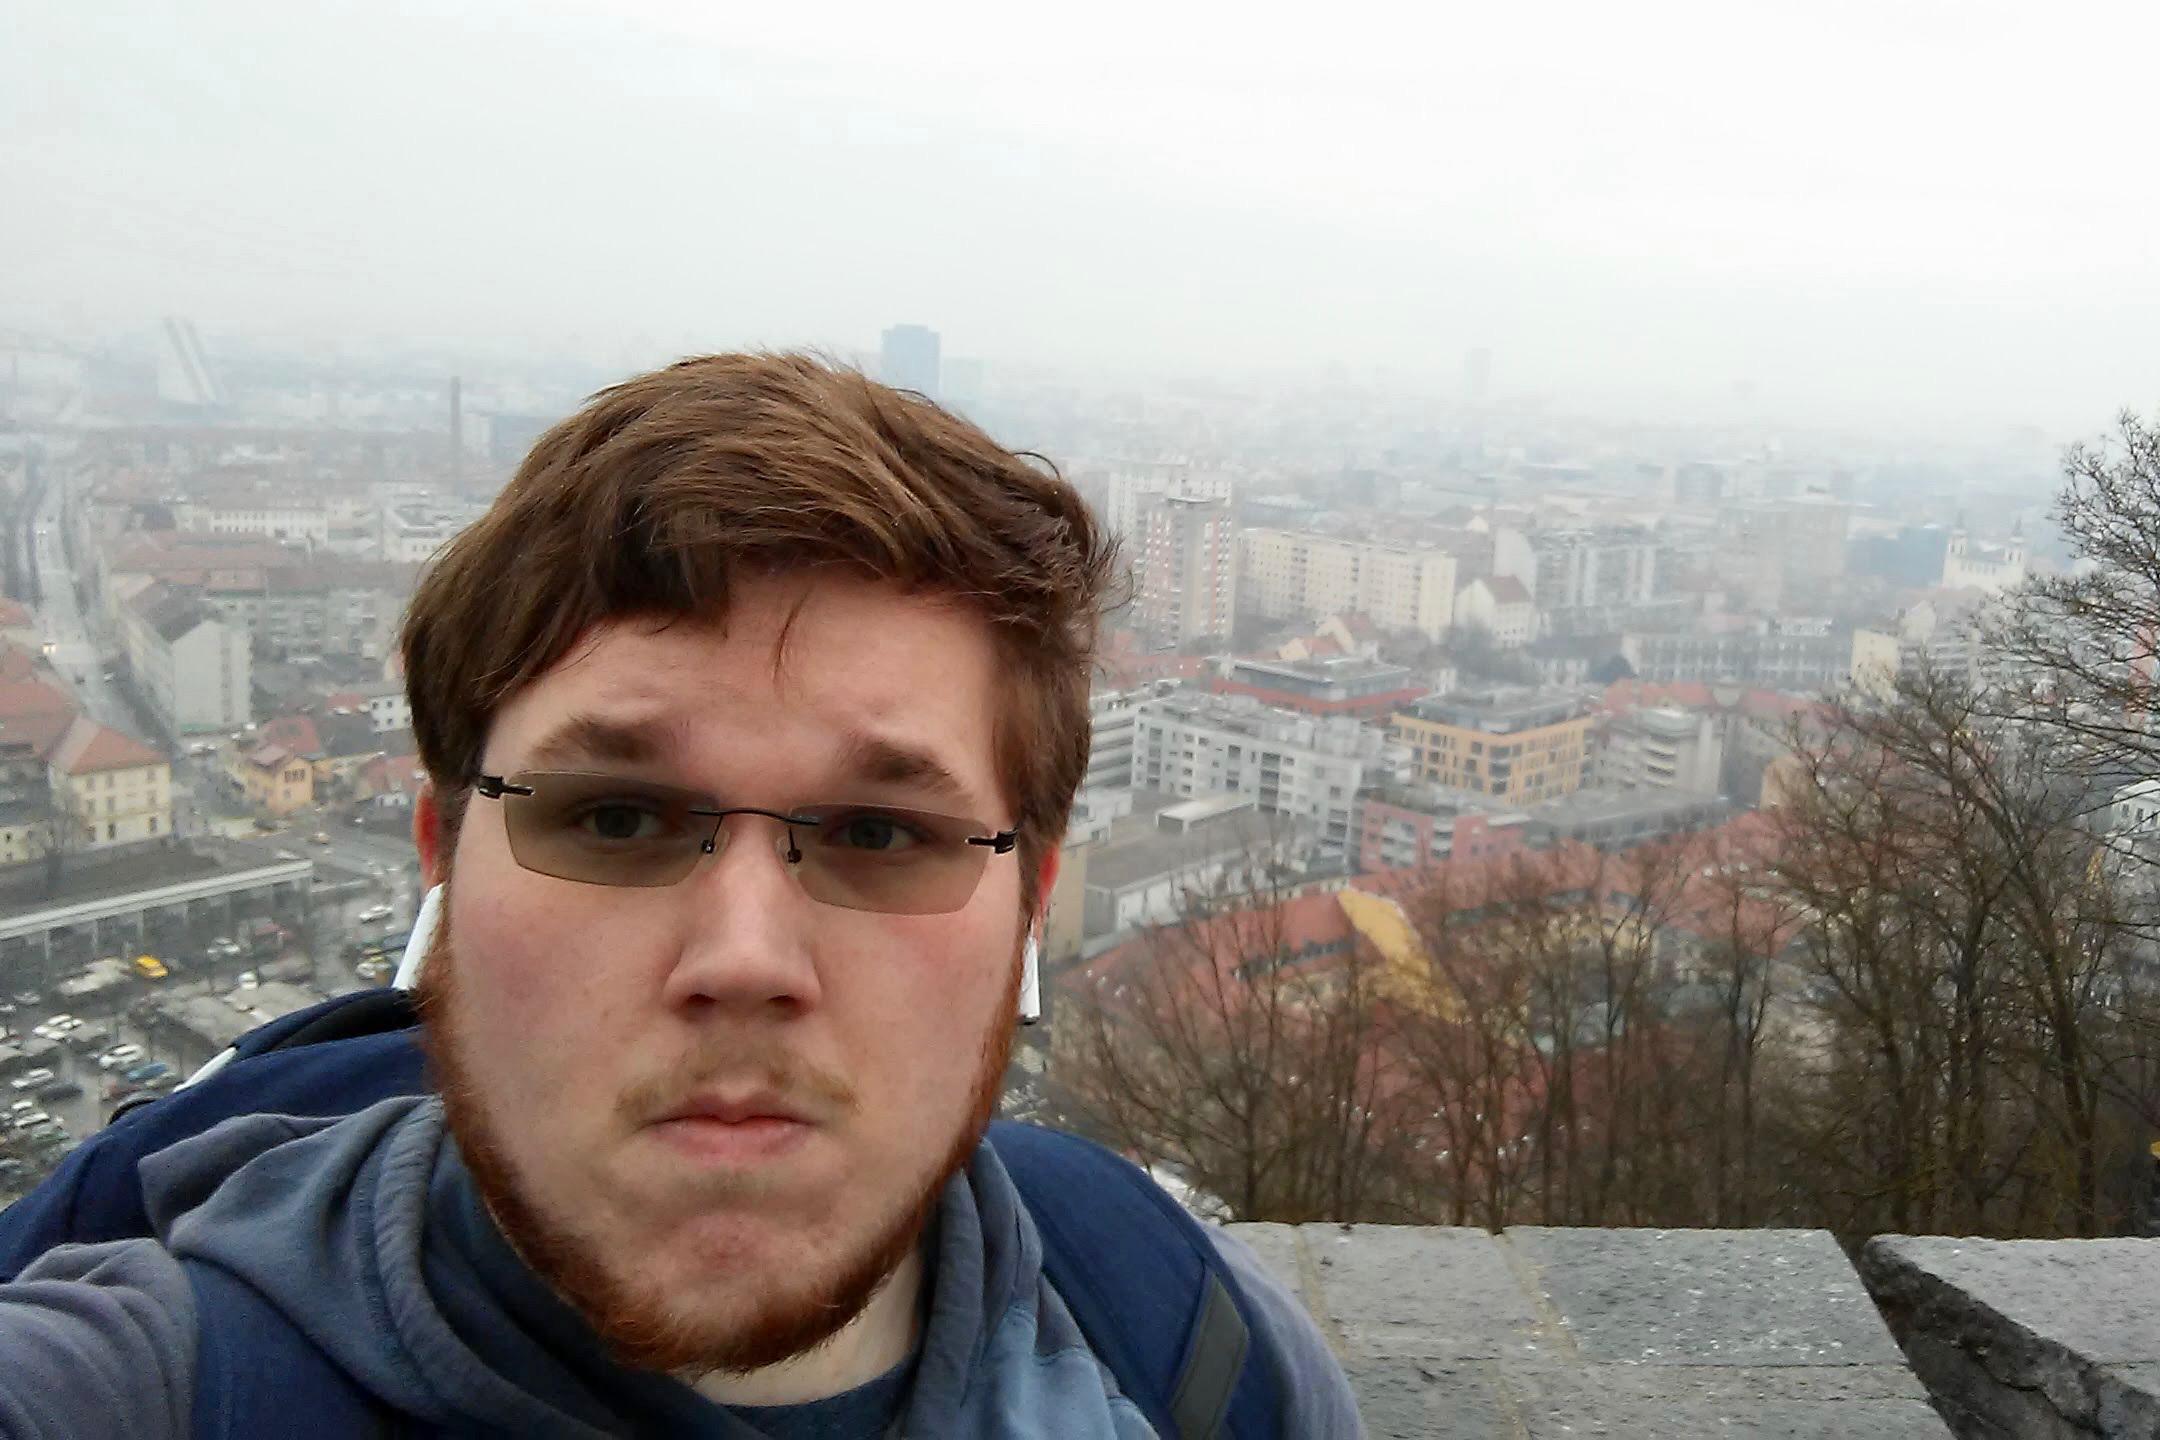 Austin Peay history graduate lands prestigious scholarship at Polish university